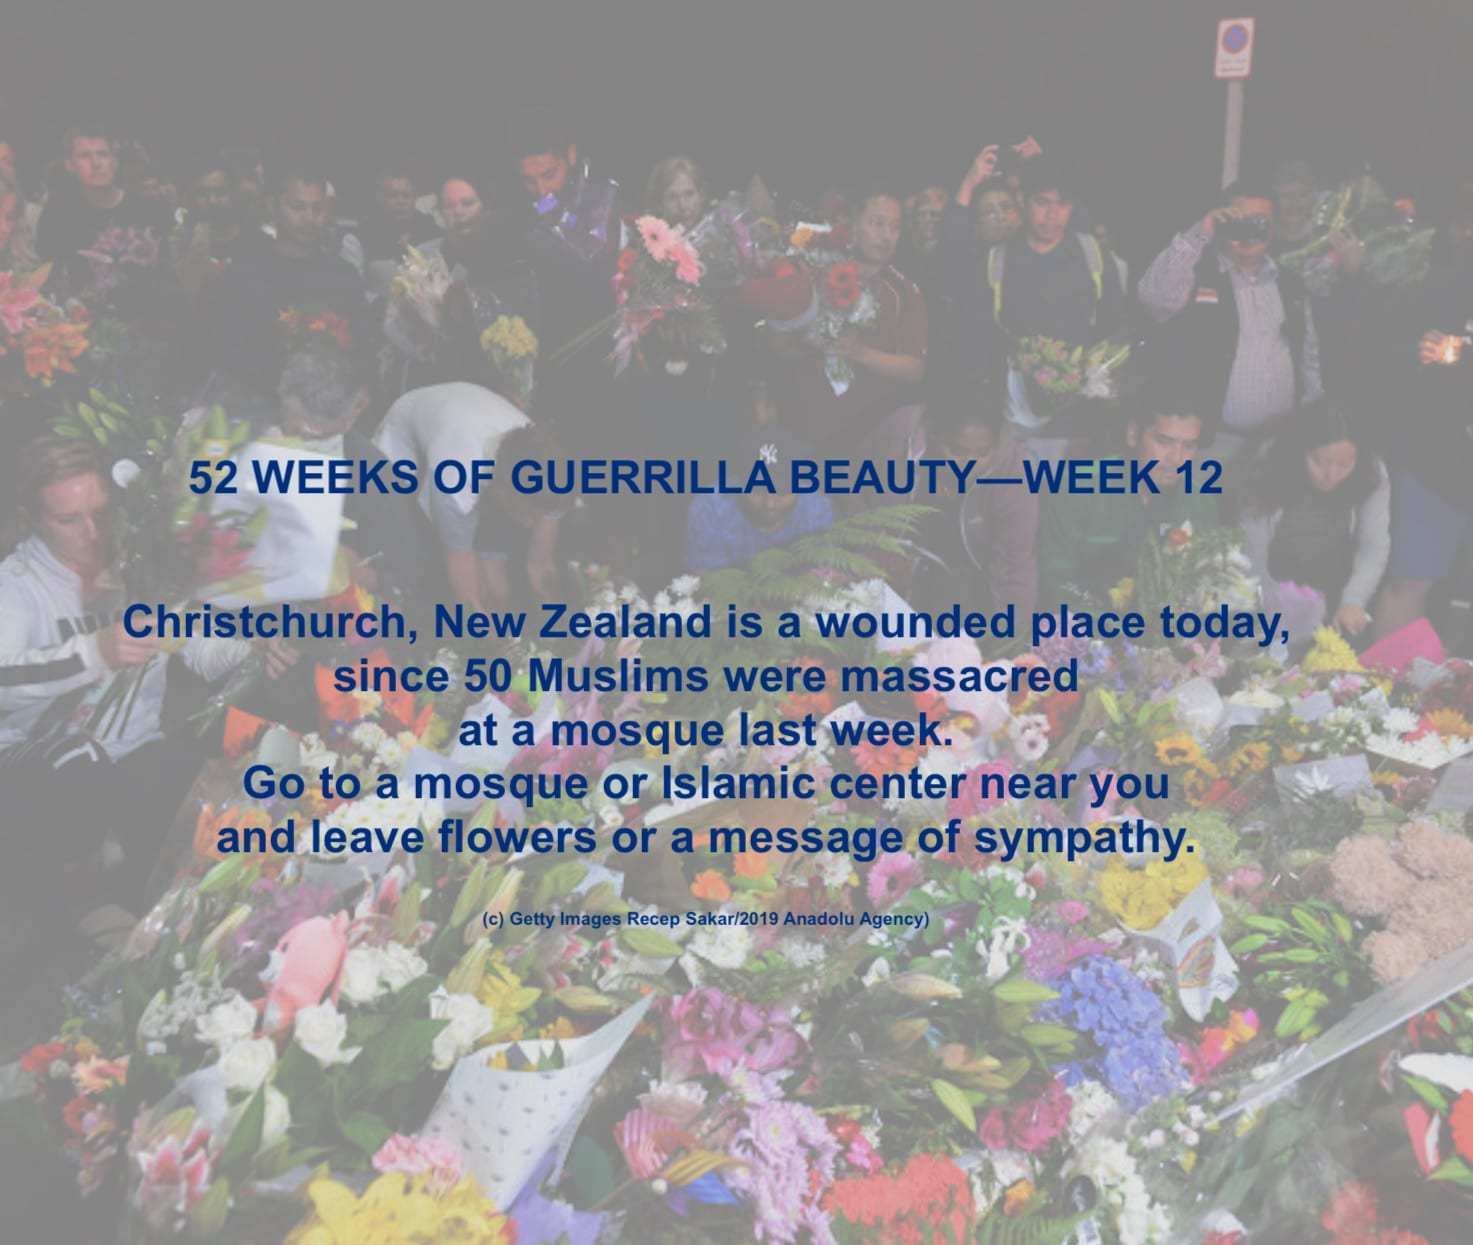 Christchurch Mosques Shooting